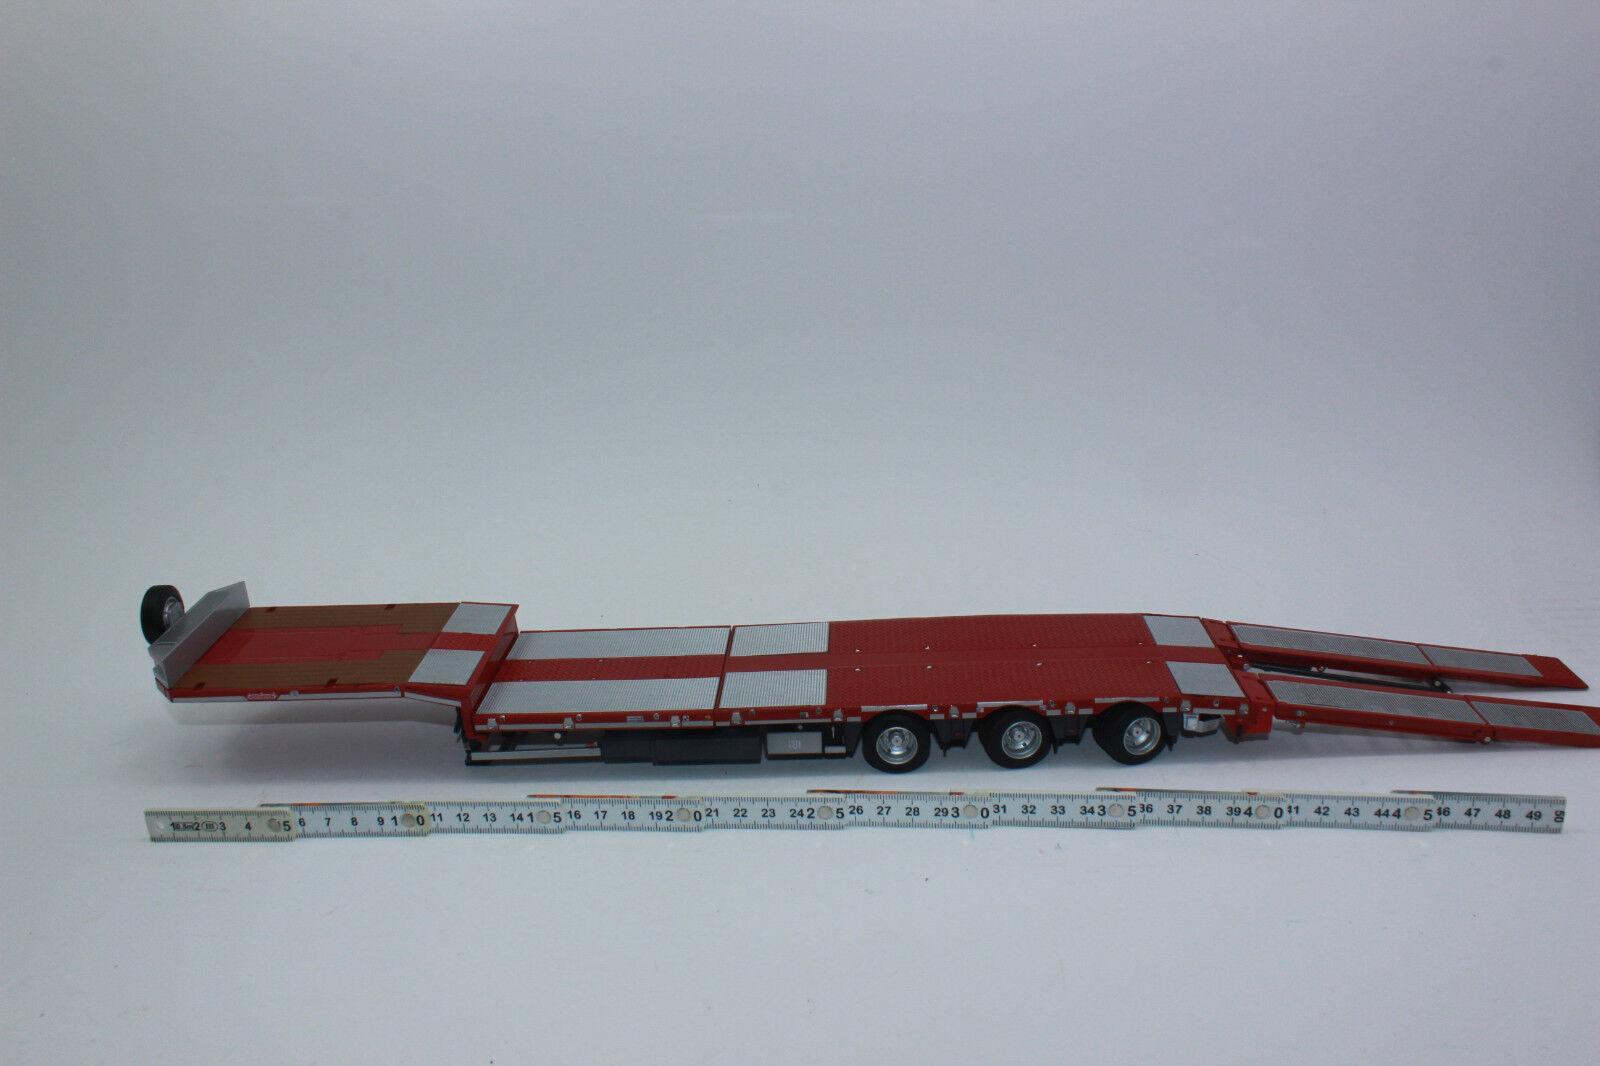 Marge 1813-01 remorque 3 Axe Rouge NOOTEBOOM  MCOs 48-03 NEUF avec neuf dans sa boîte  1 32  100% garantie de prix